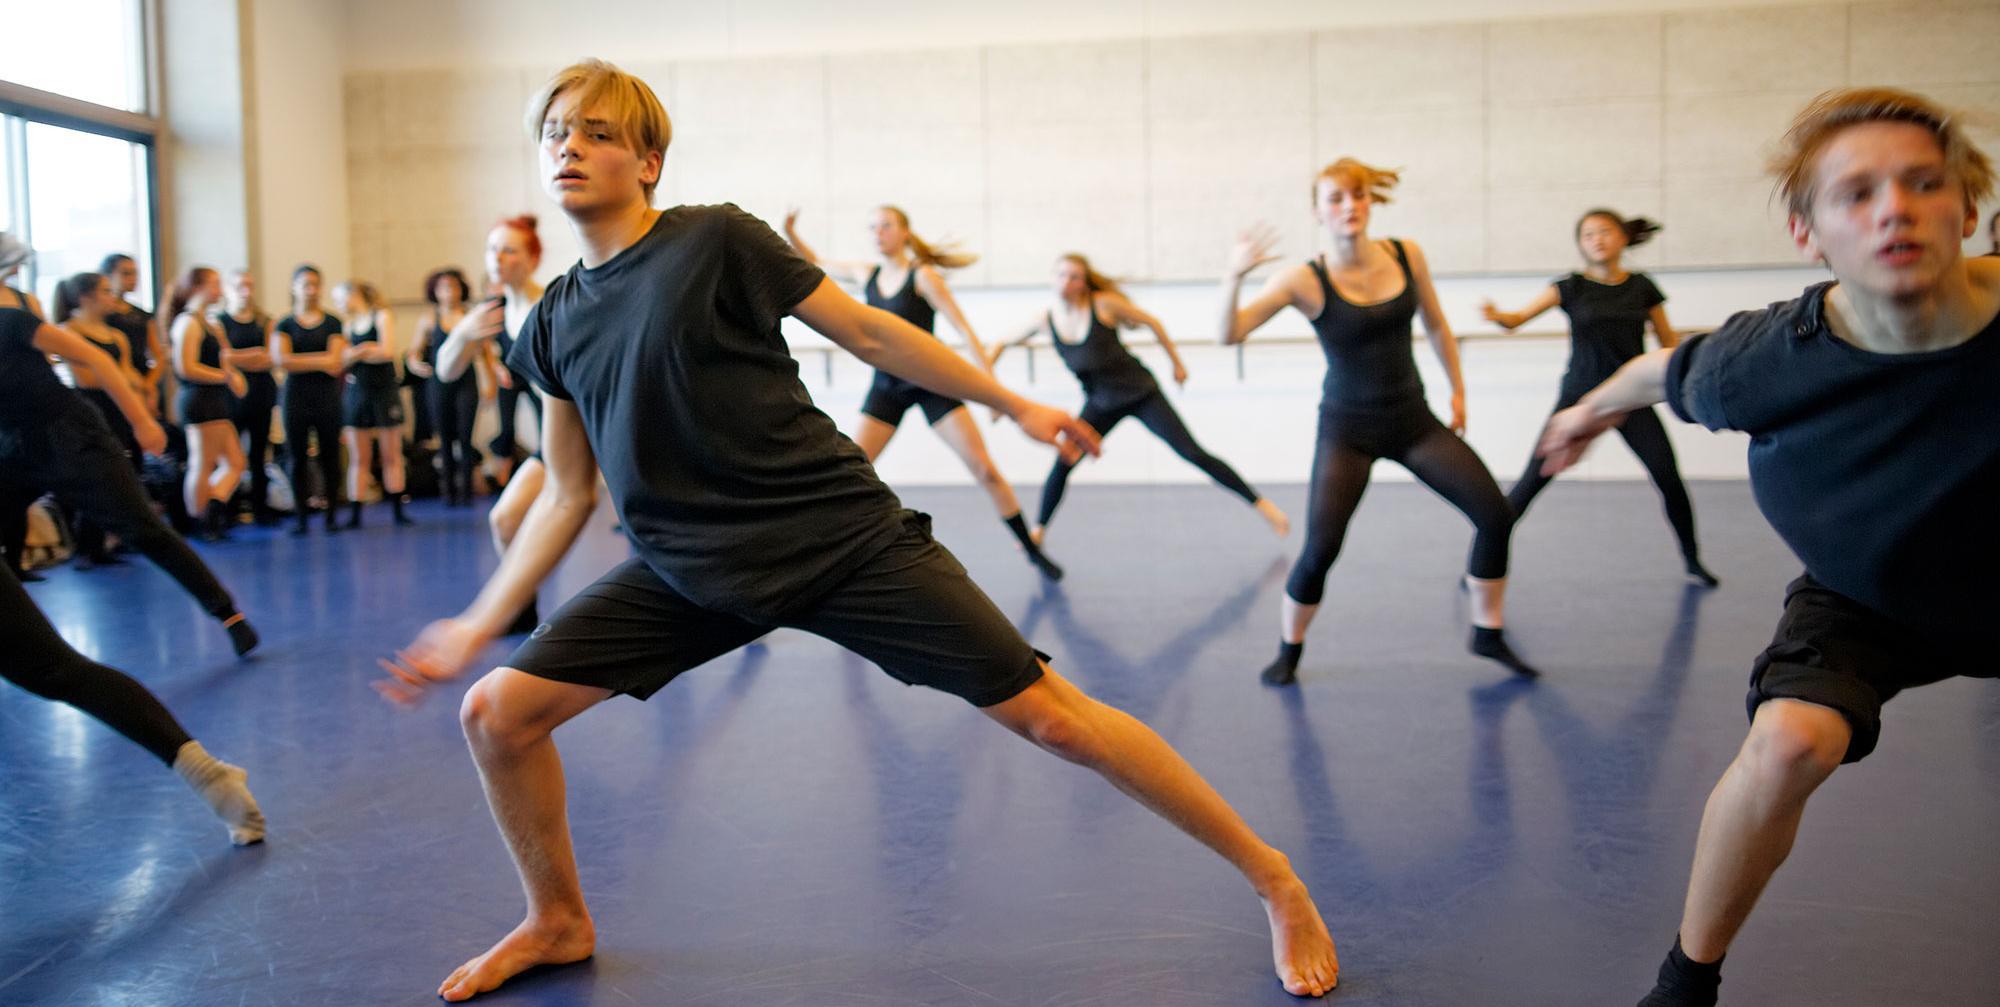 Zeer 5 o'clock class - Academy of Theatre and Dance - AHK FV-64